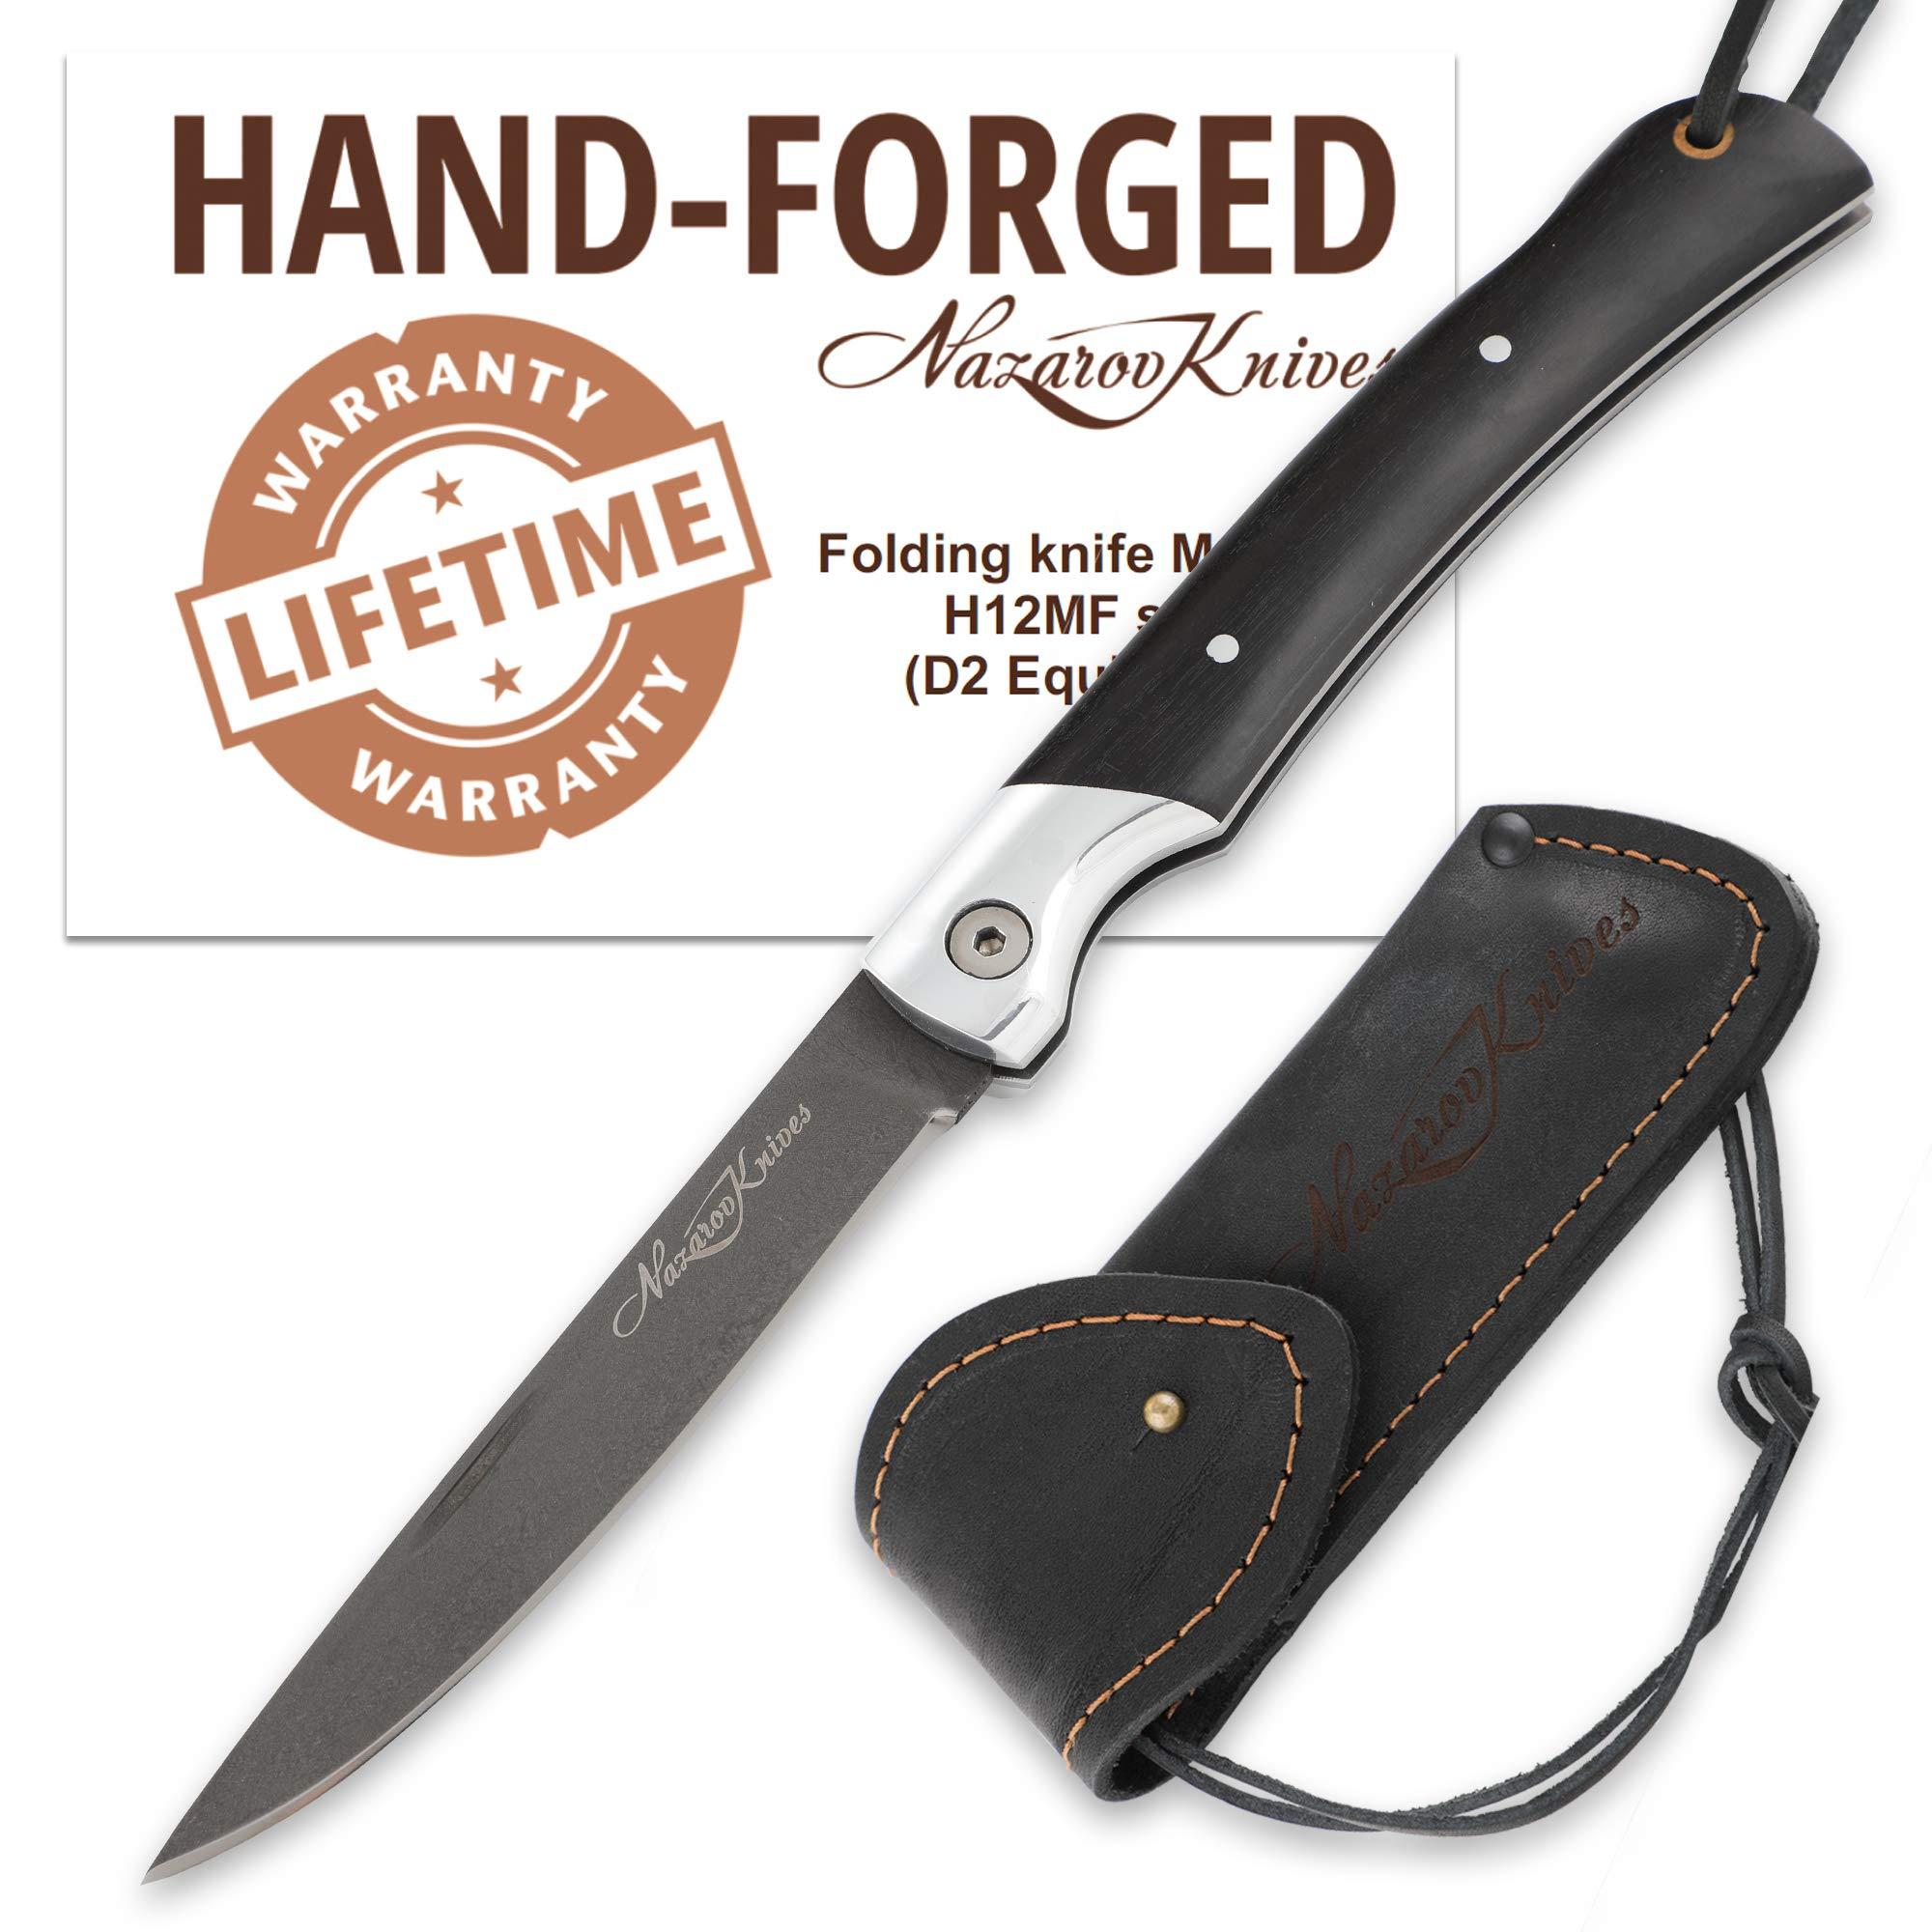 Folding Knife - Slender Designed Blade - D2 Steel - Razor Sharp - Hornbeam Handle - Leather Sheath